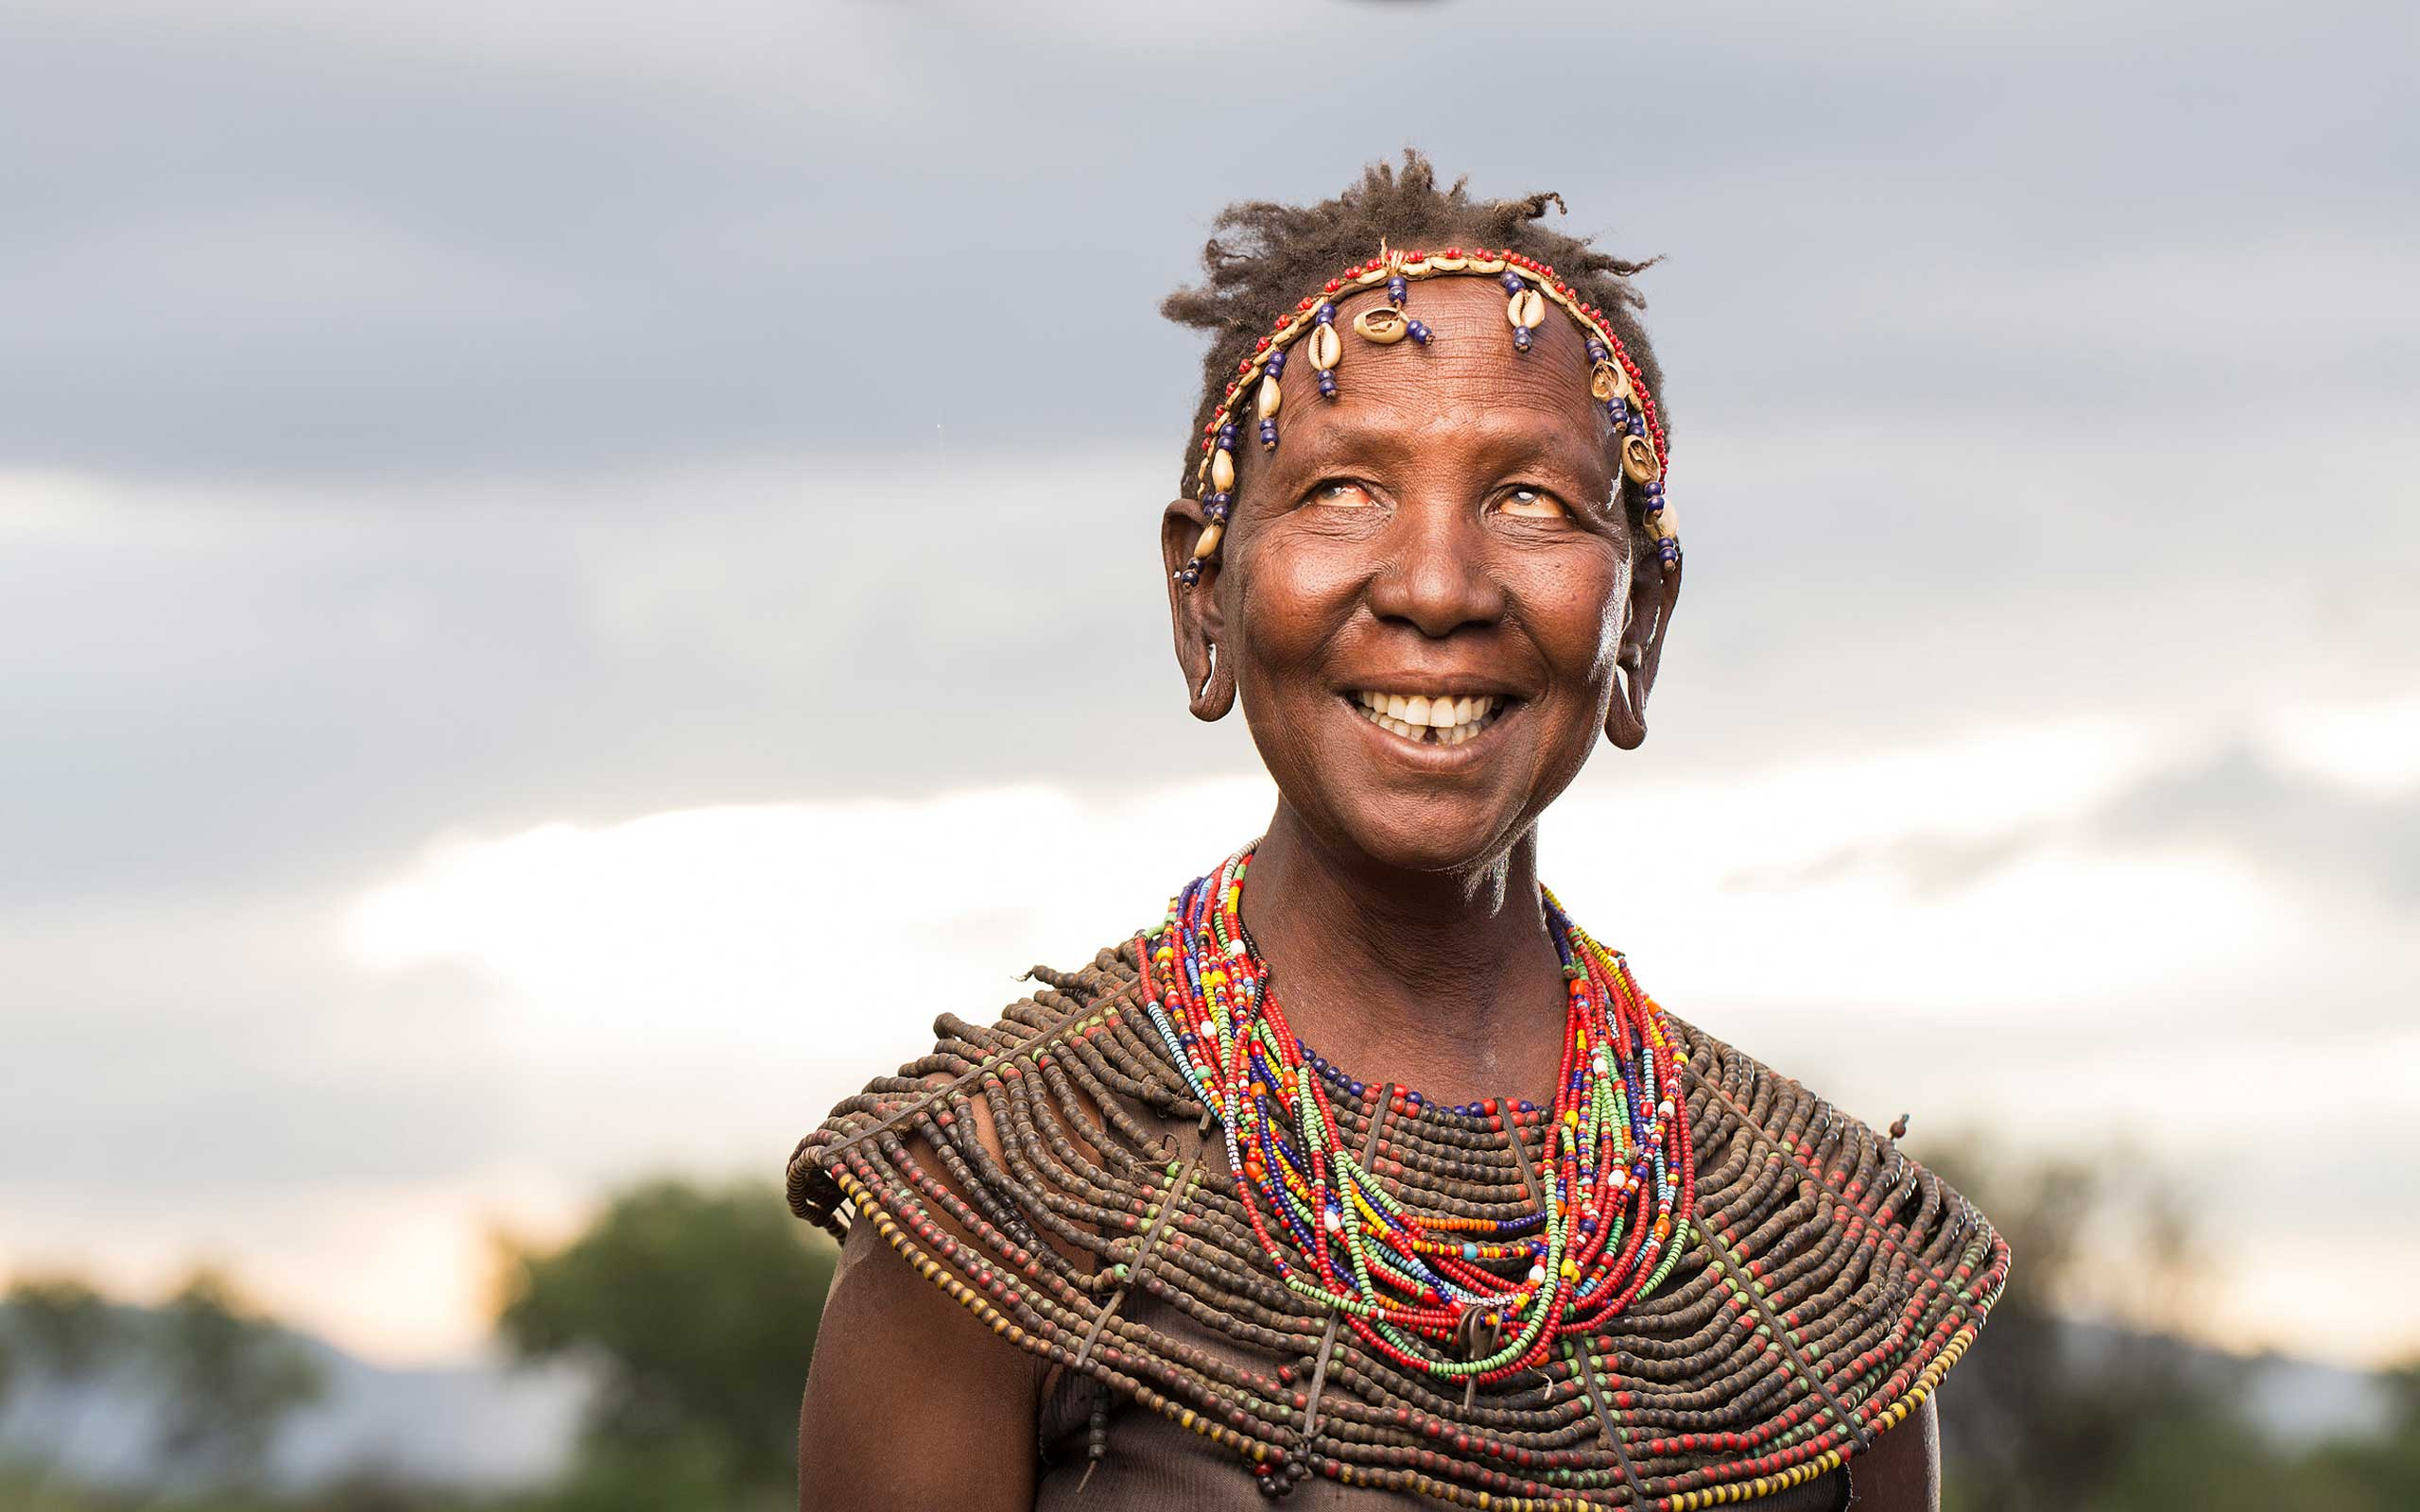 Nominated in the Smile category. Joseph Makeni's work on the Pokot Village in Bogoria, Kenya.